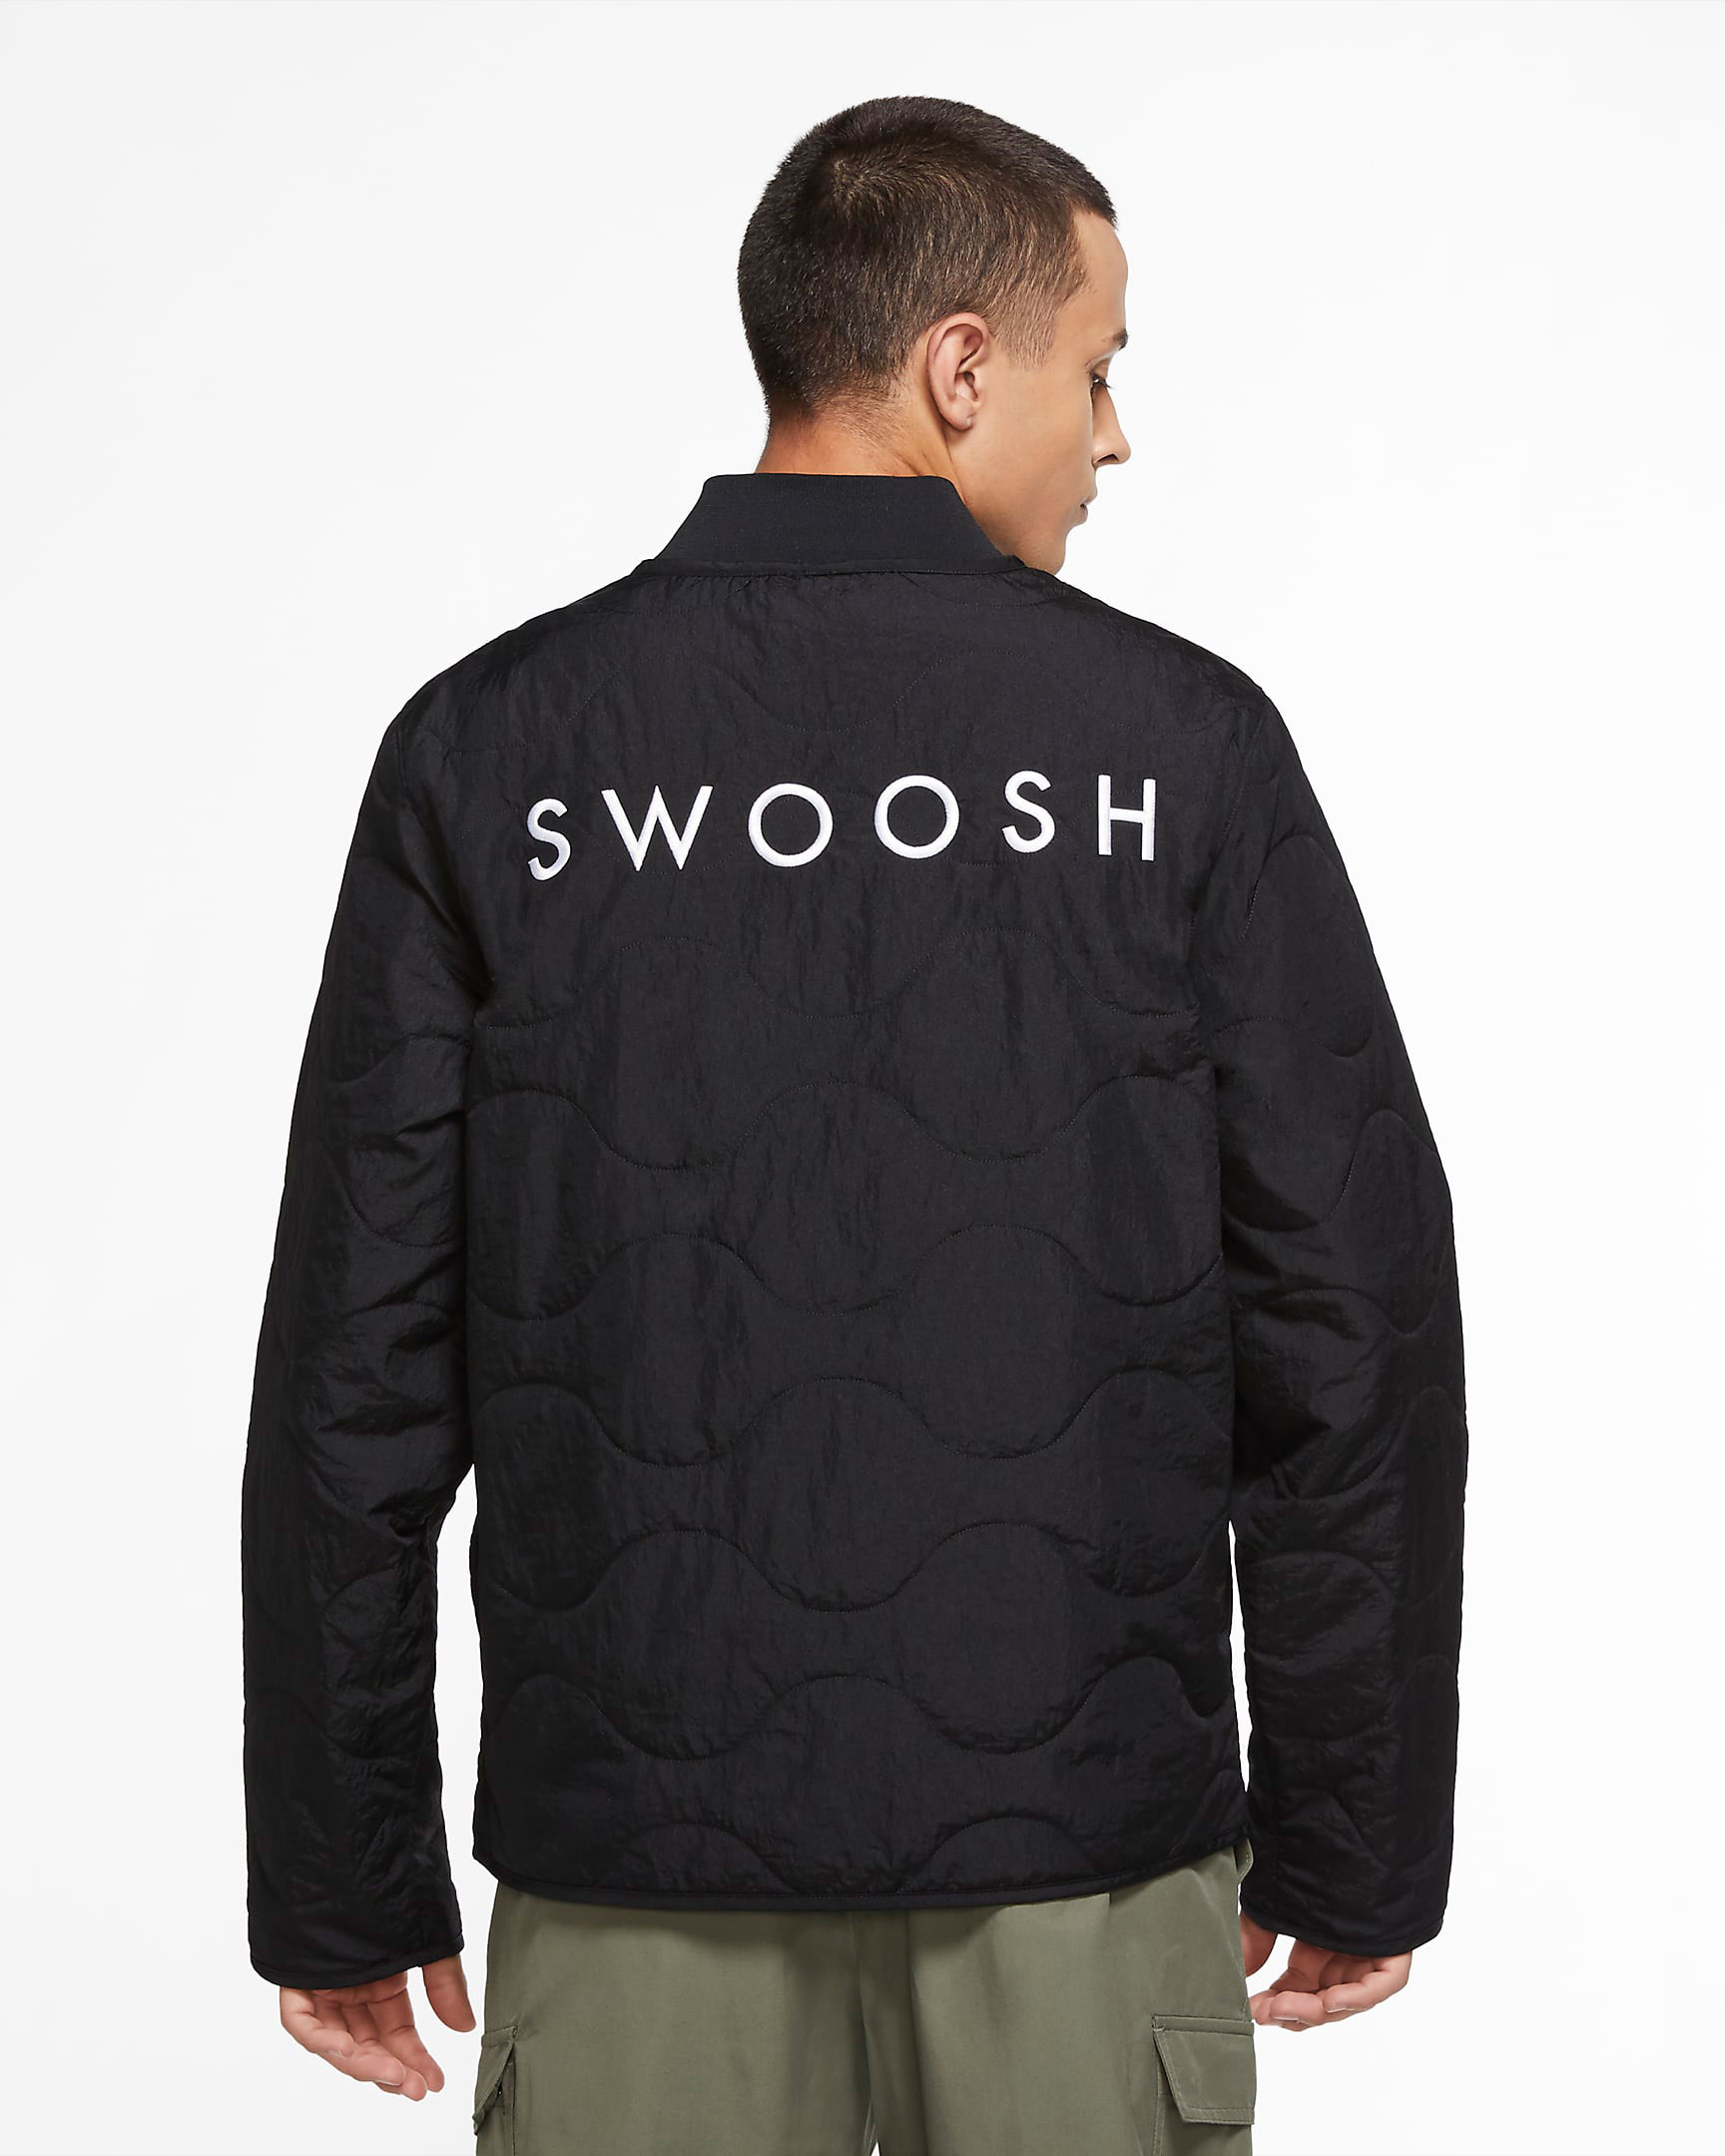 nike-swoosh-quilted-jacket-black-white-2